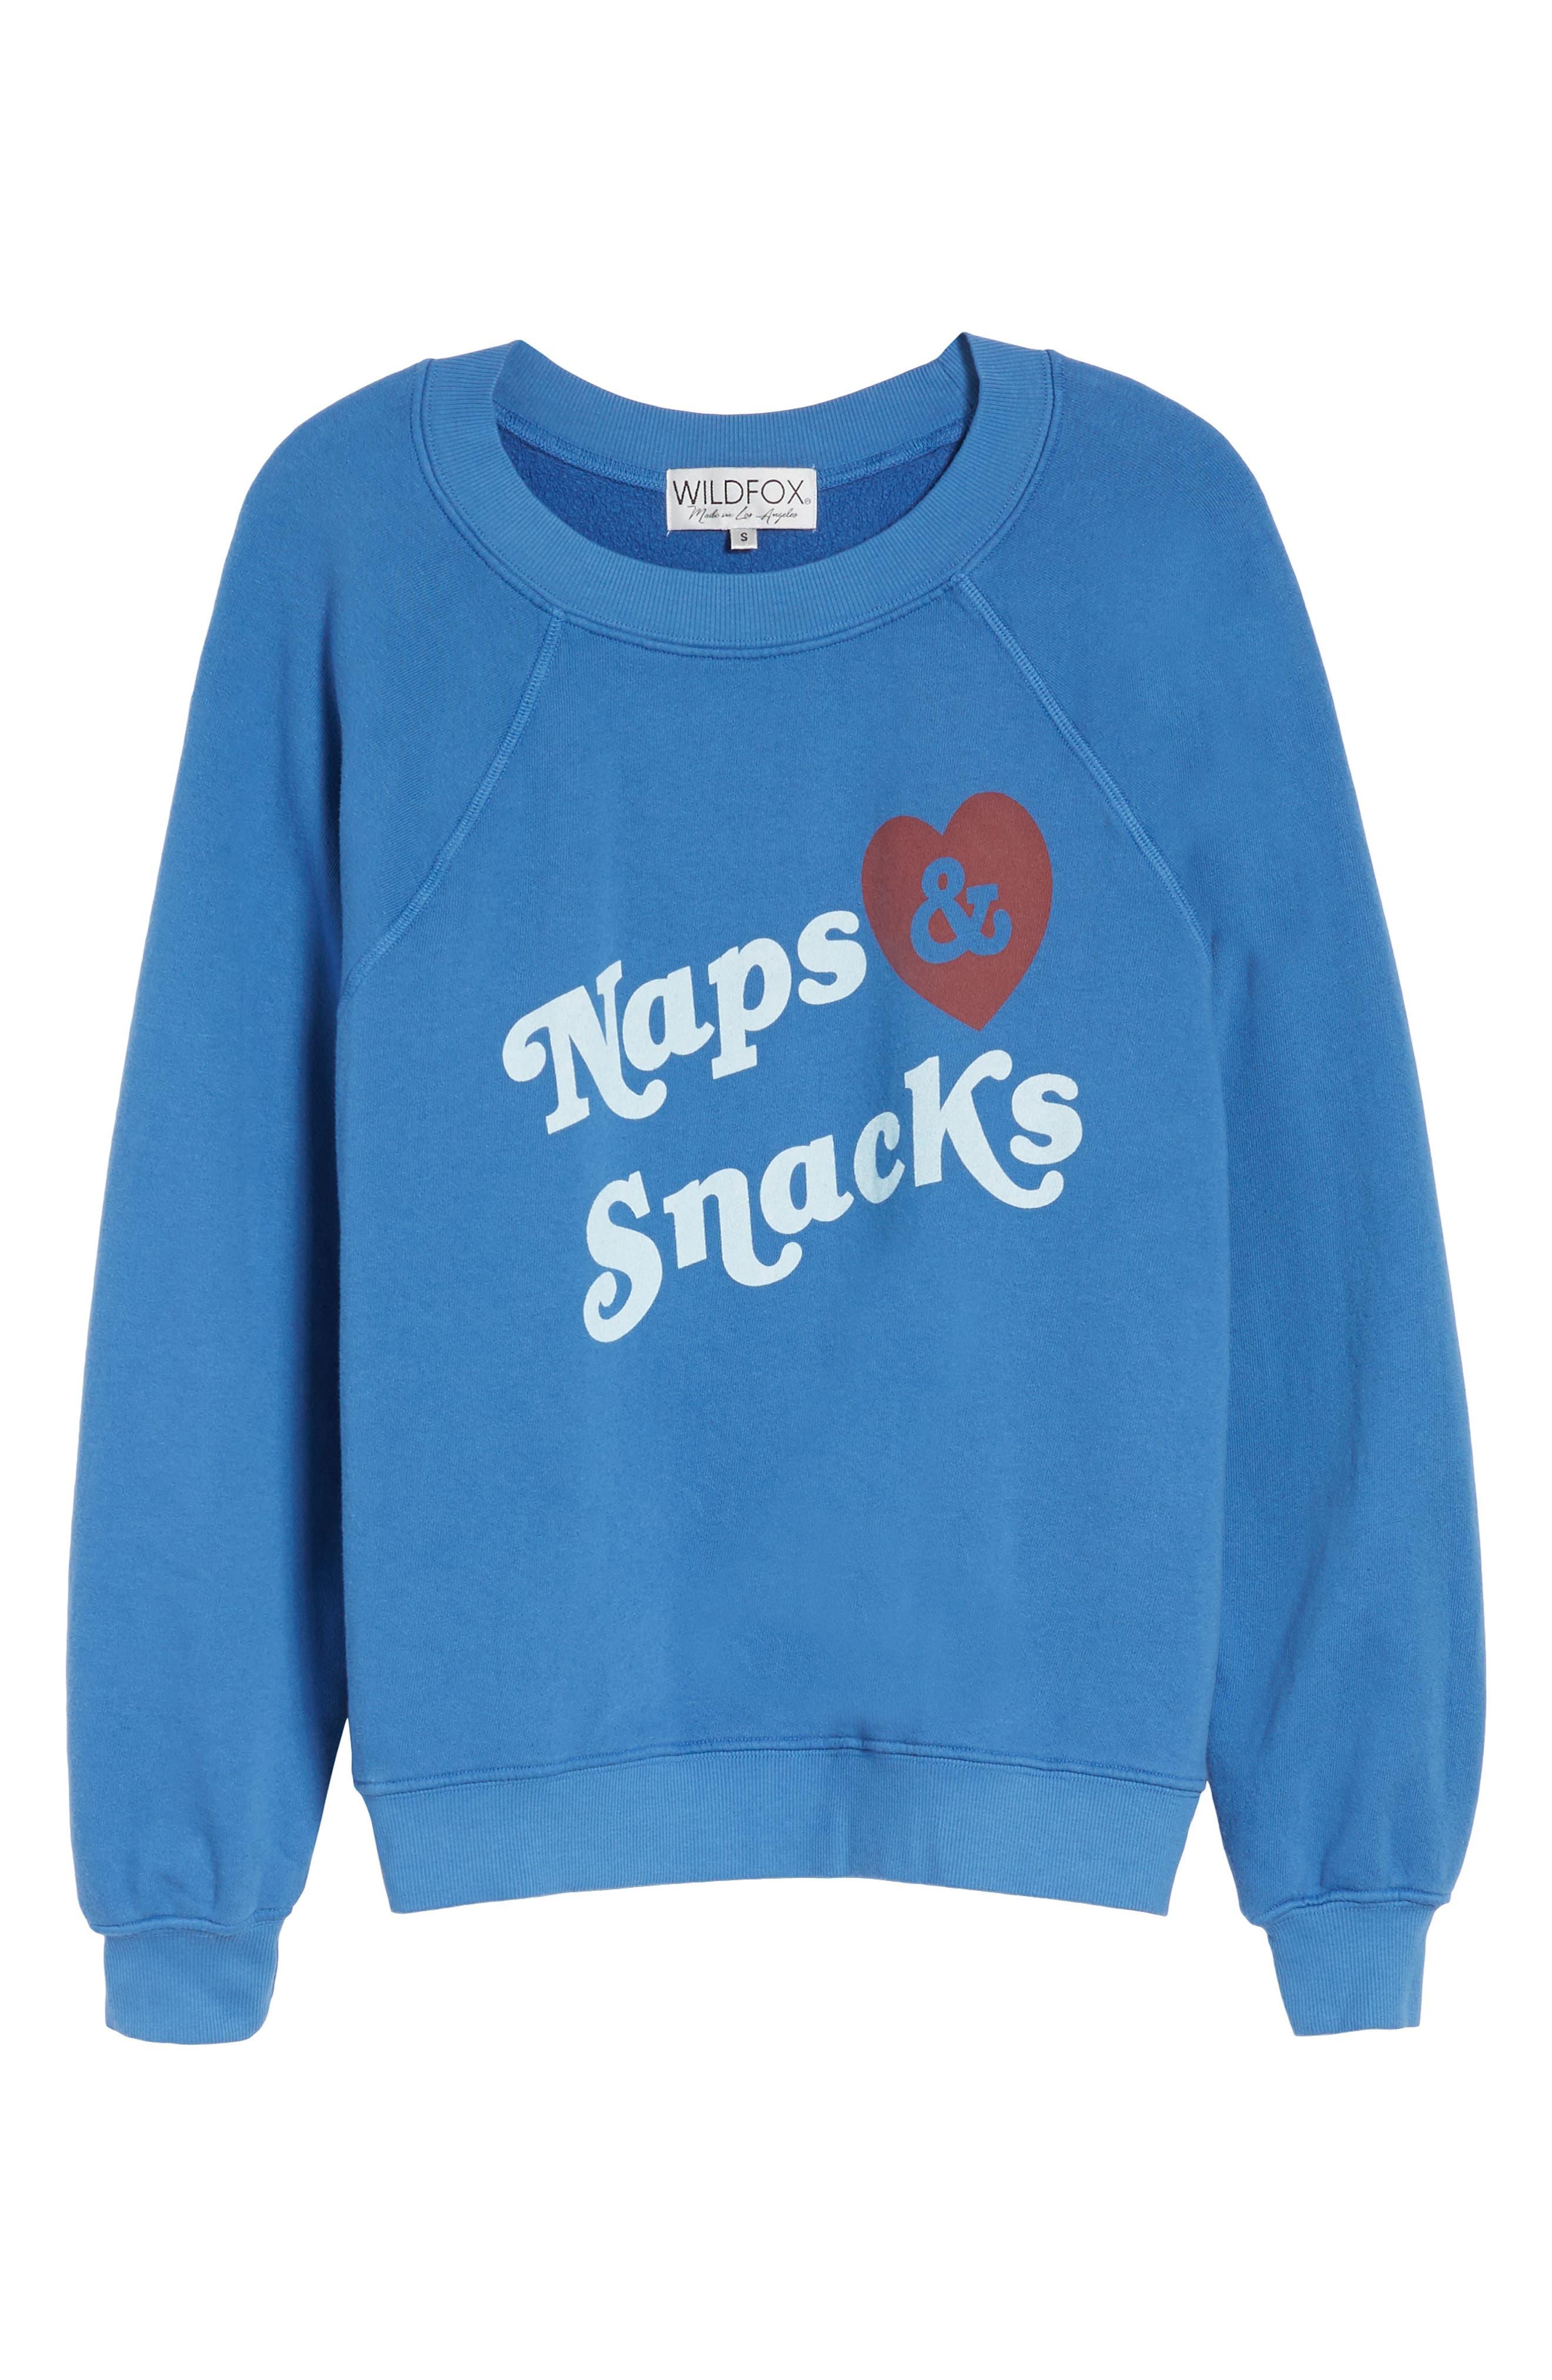 Naps & Snacks Sweatshirt,                             Alternate thumbnail 6, color,                             400